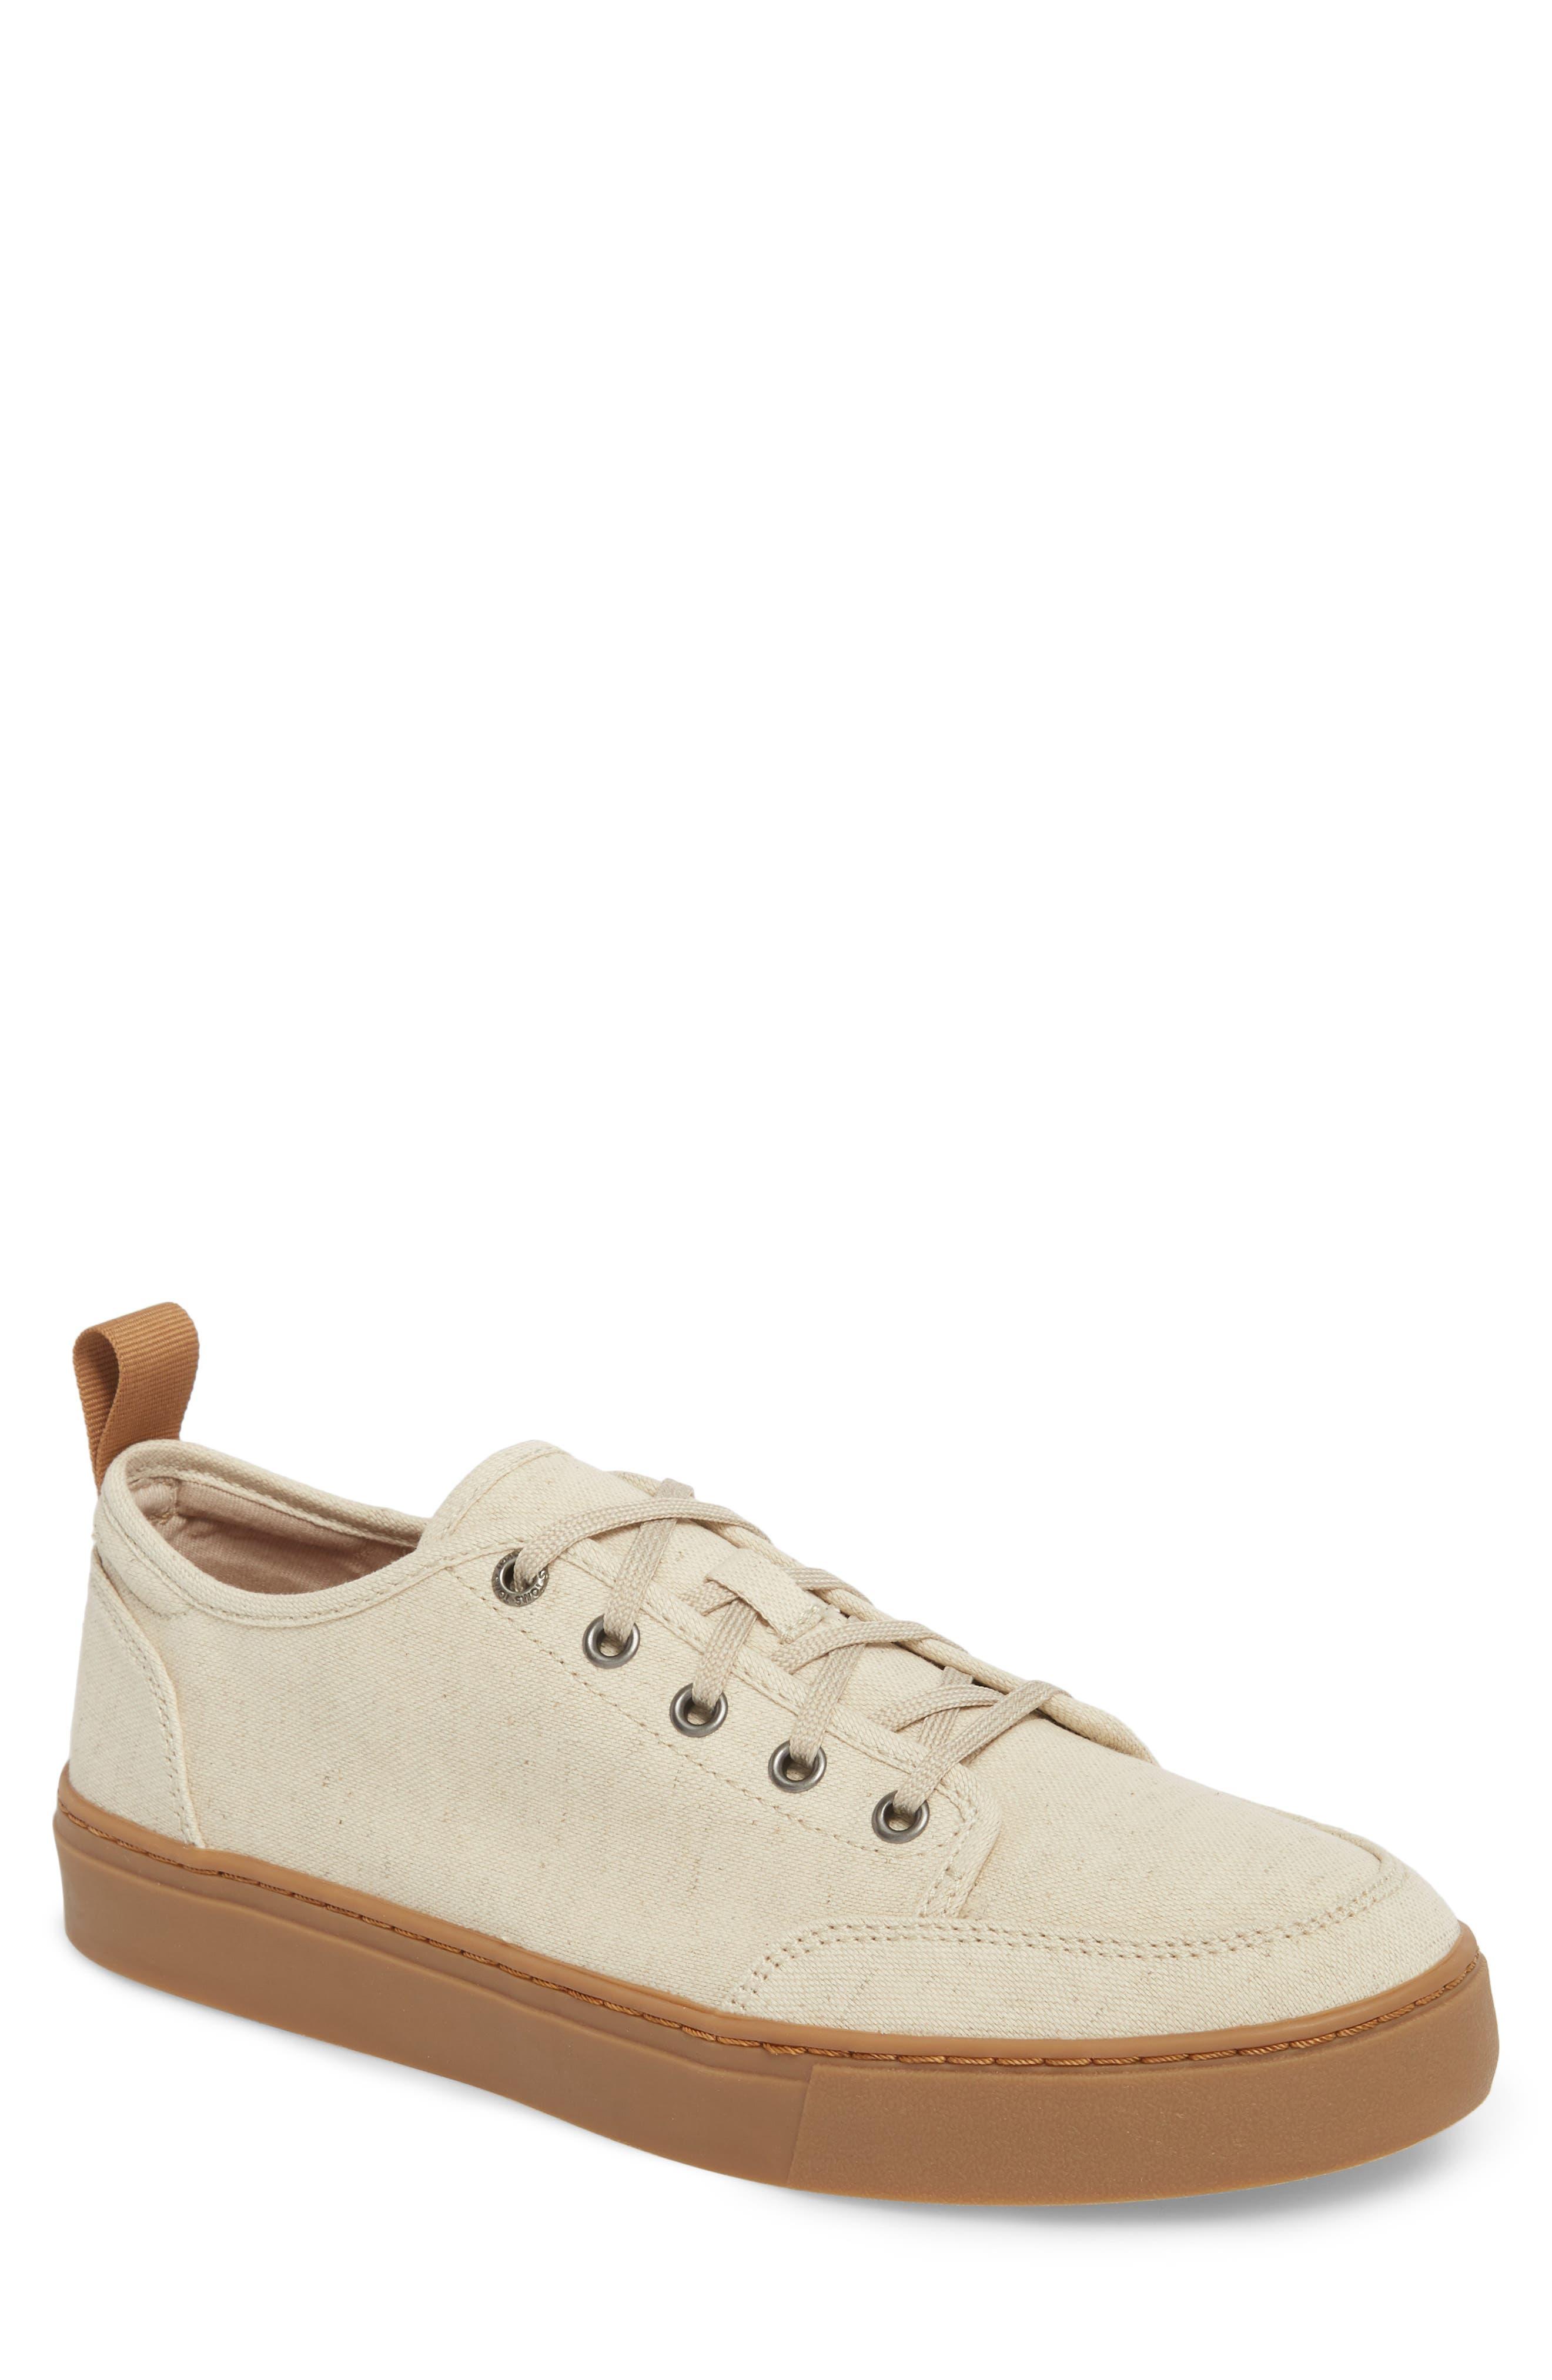 Landen Low Top Sneaker,                             Main thumbnail 1, color,                             Natural Hemp/ Gum